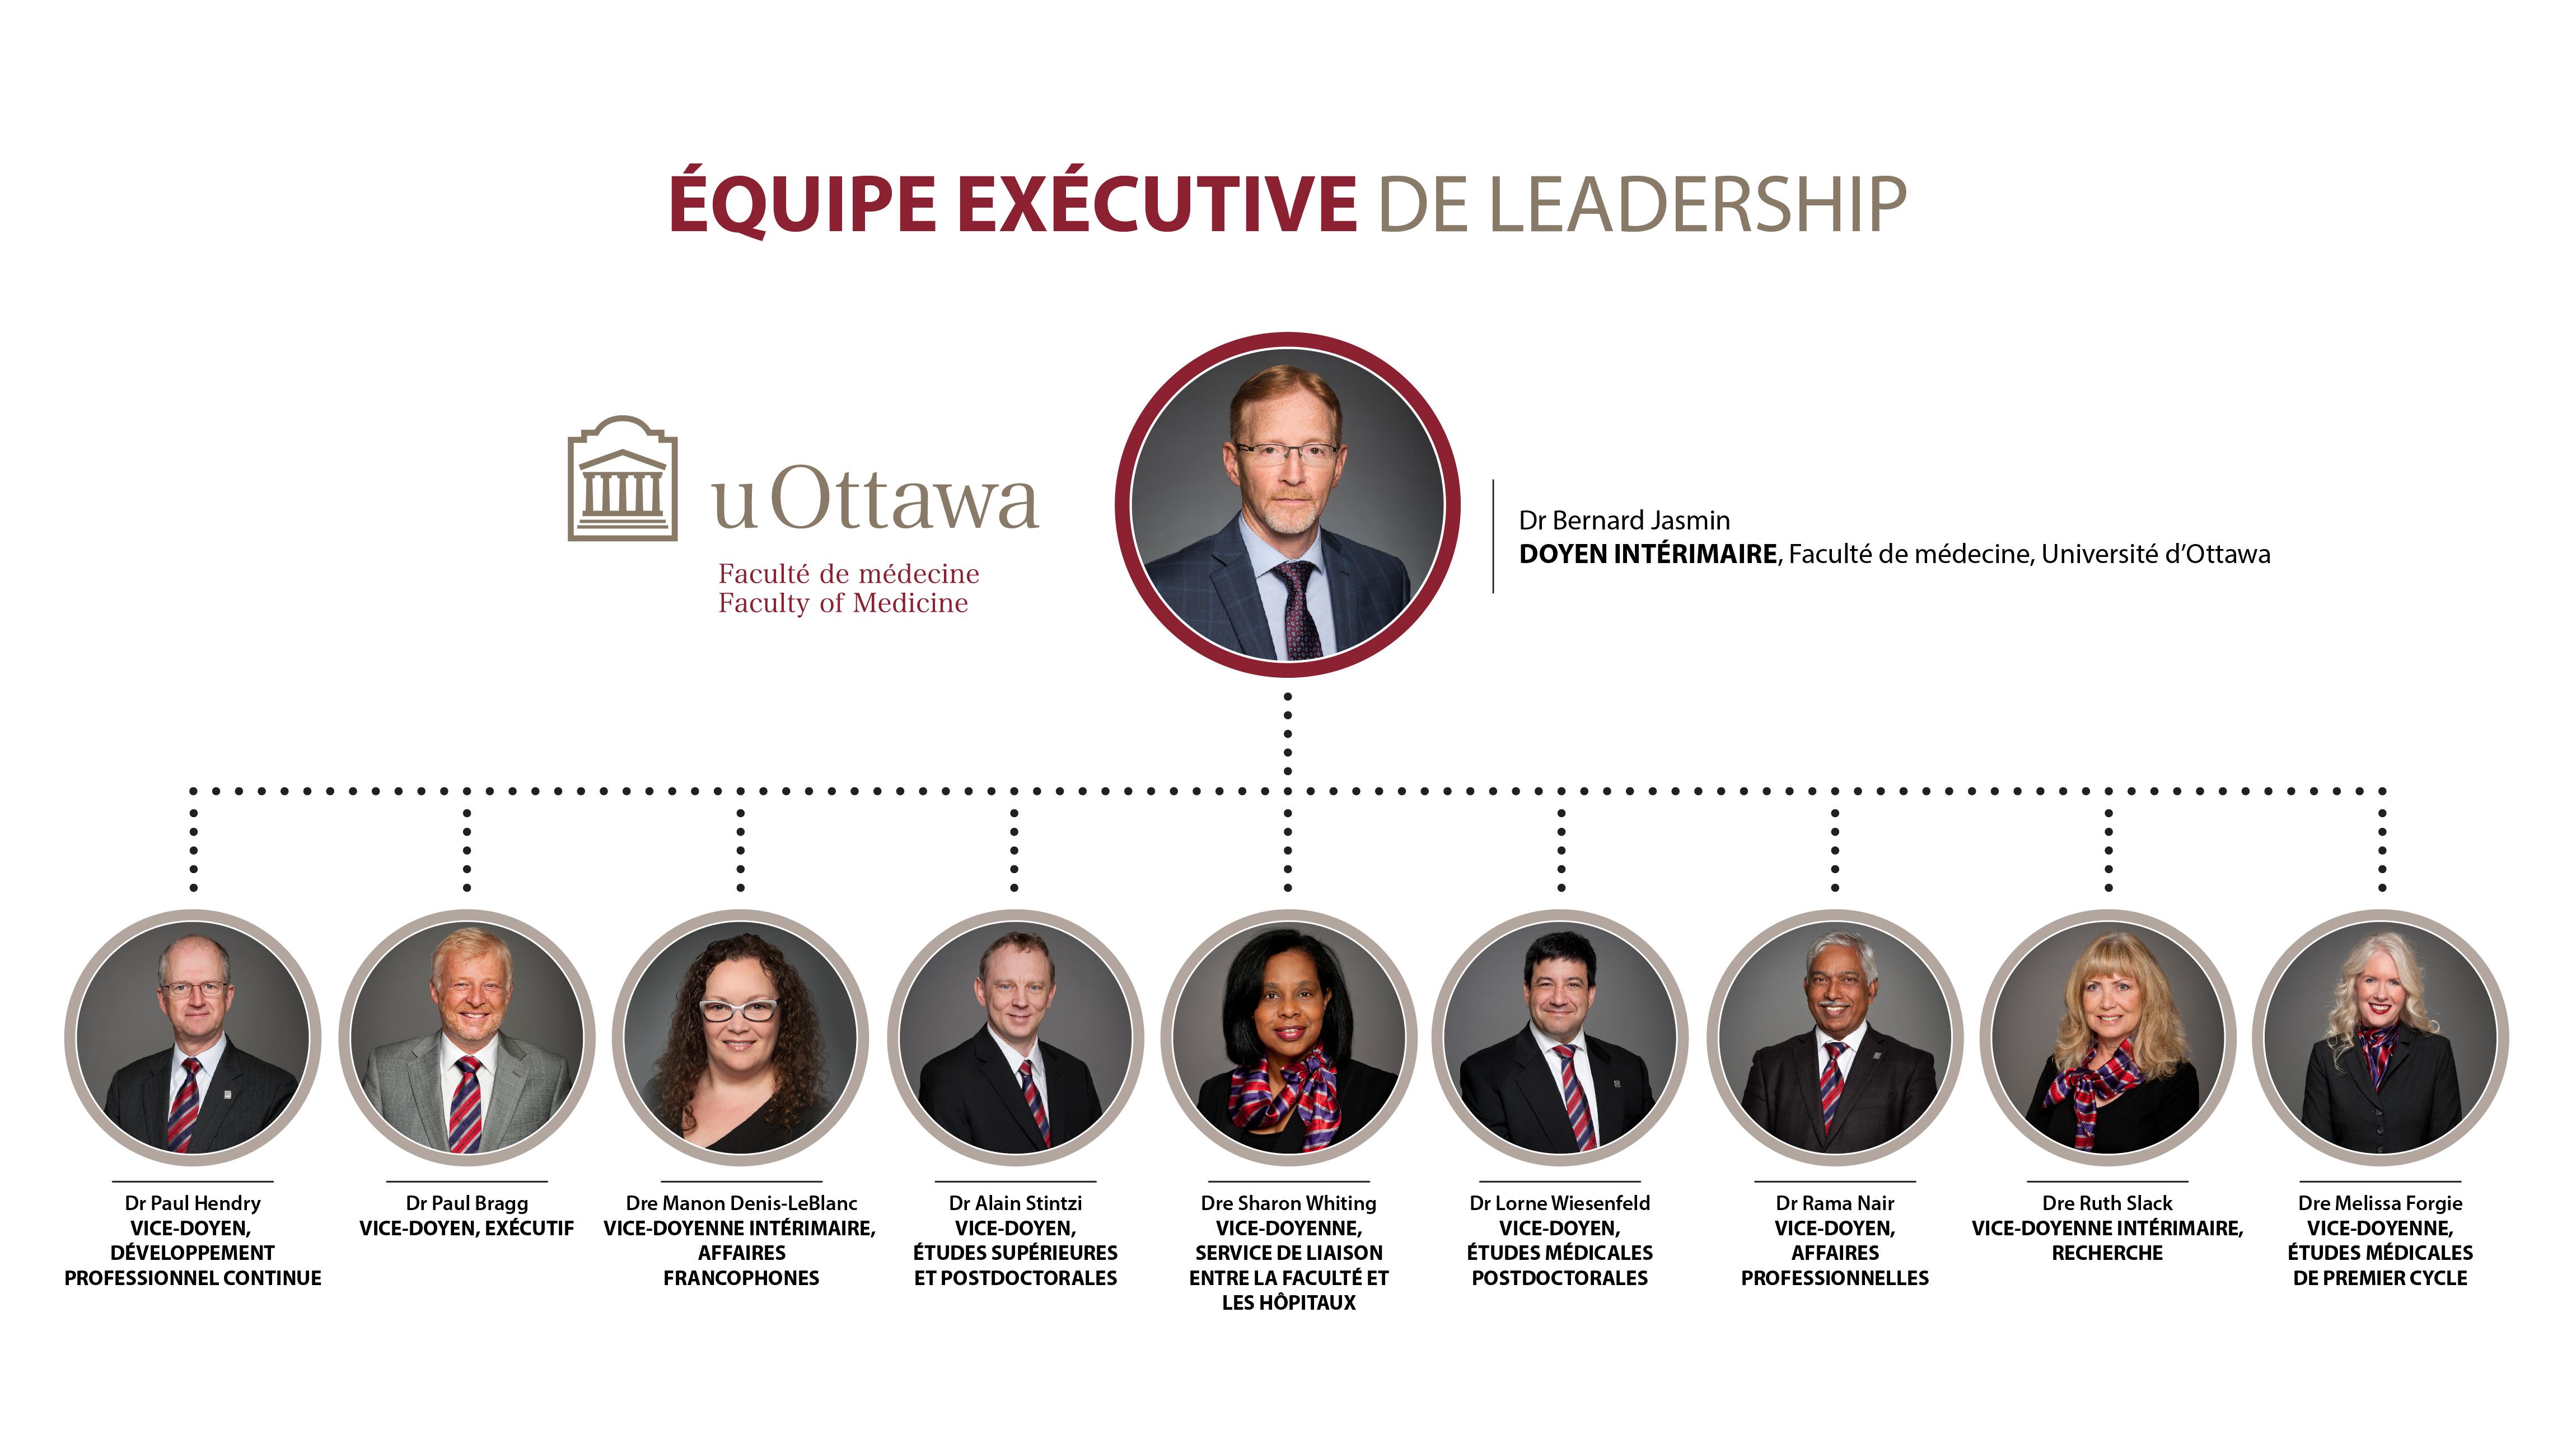 l'organigramme de l'équipe de Leadership